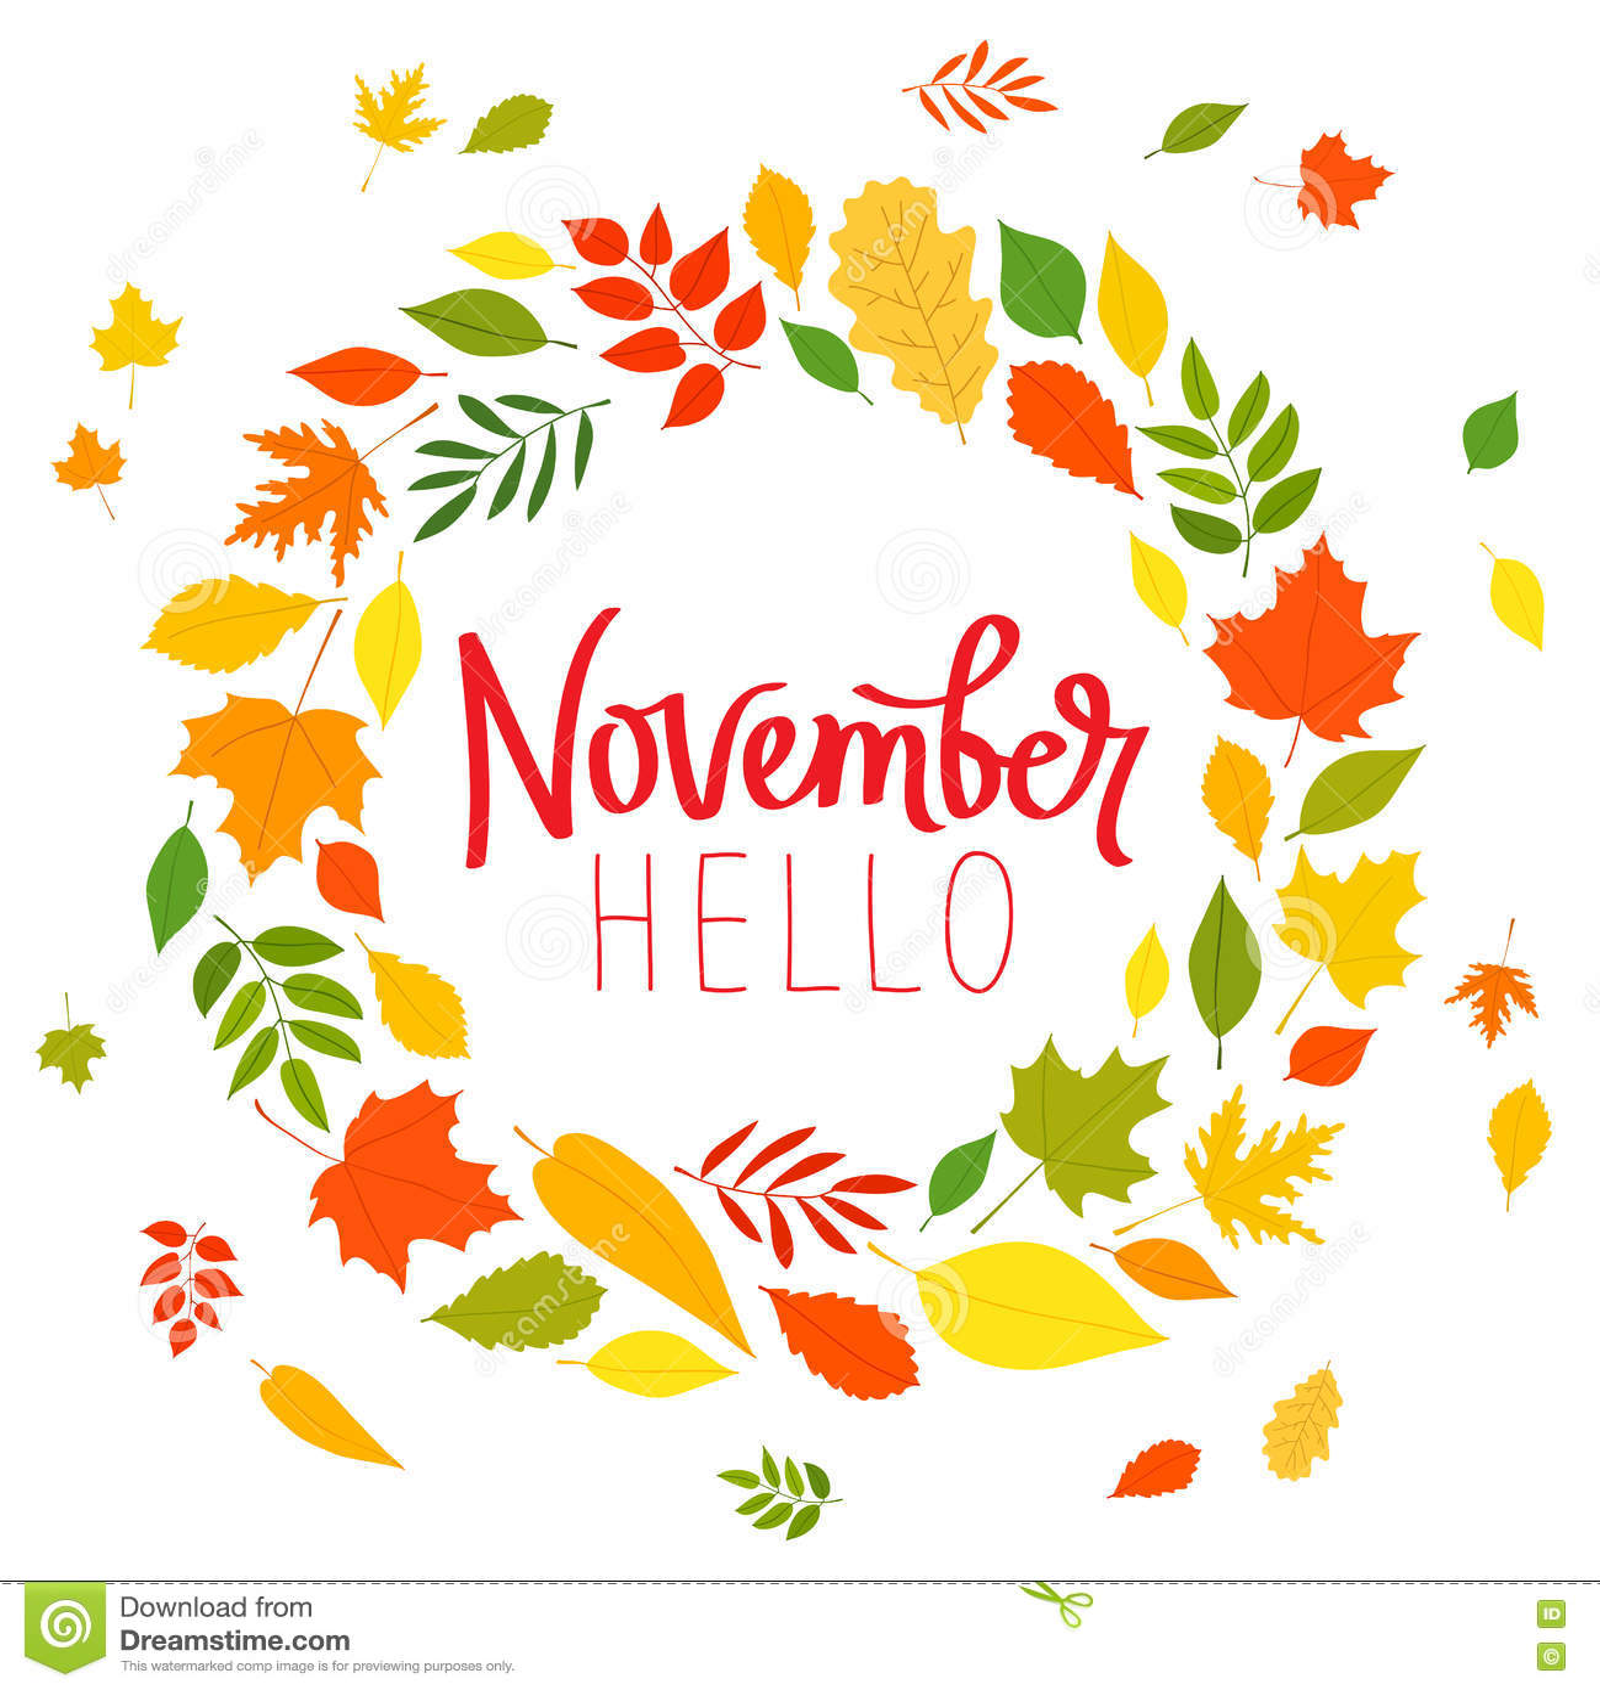 Hallo November Die Tendenzkalligraphie Vektor Abbildung ...